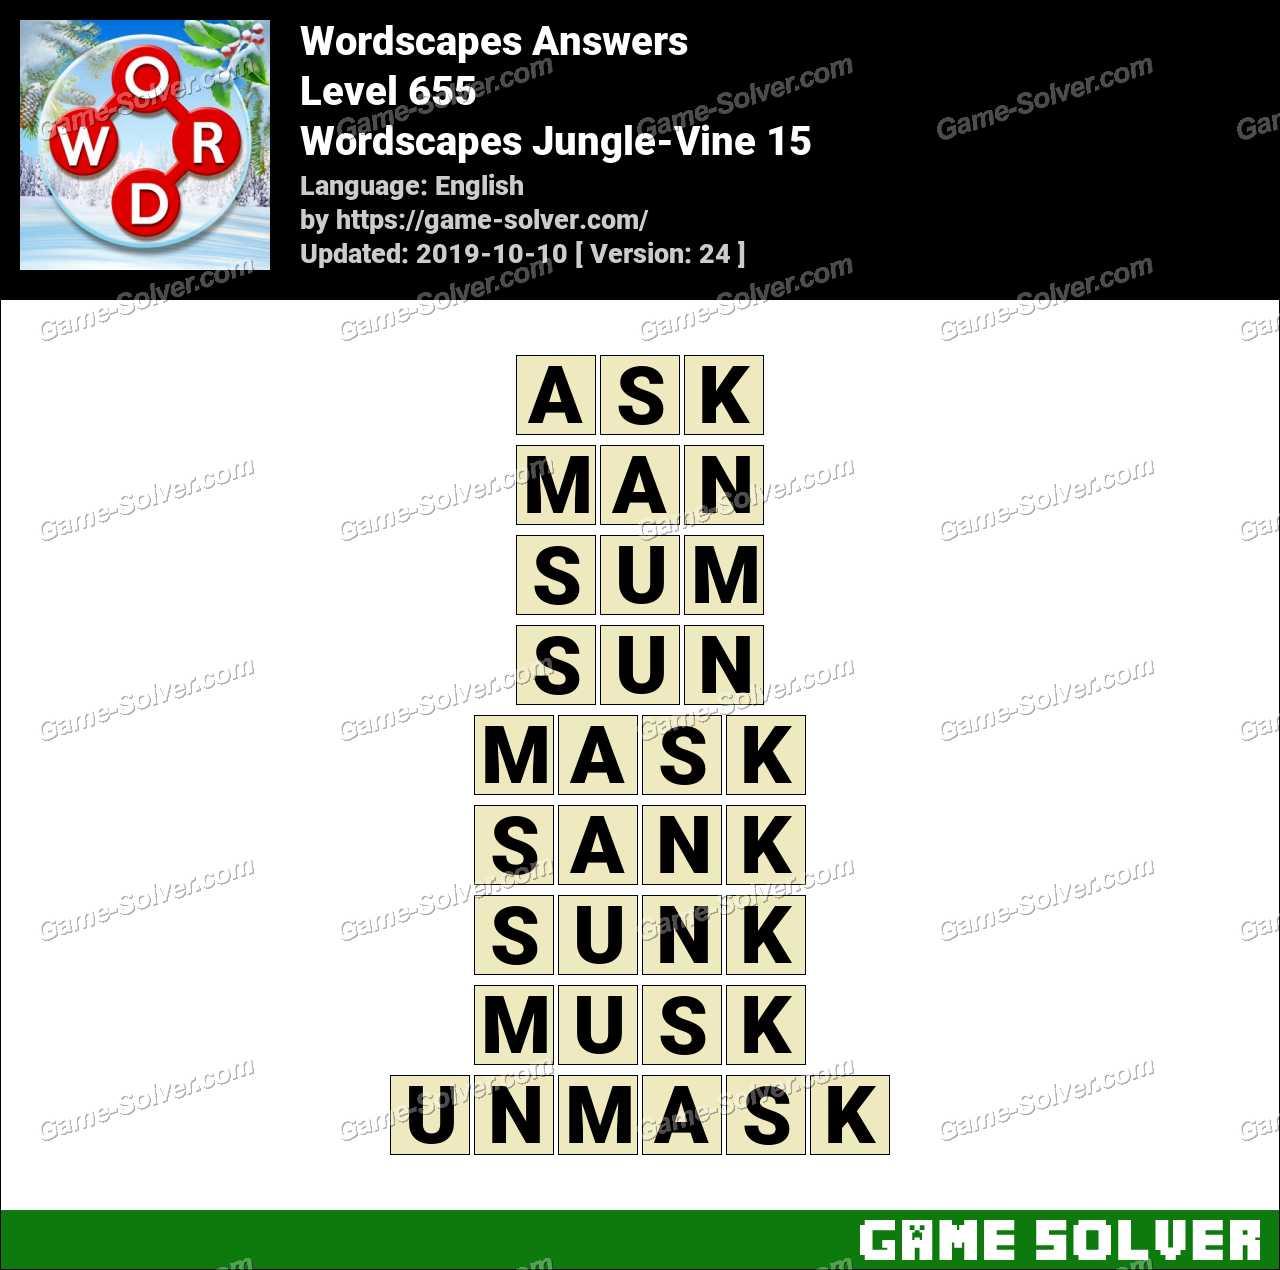 Wordscapes Jungle-Vine 15 Answers